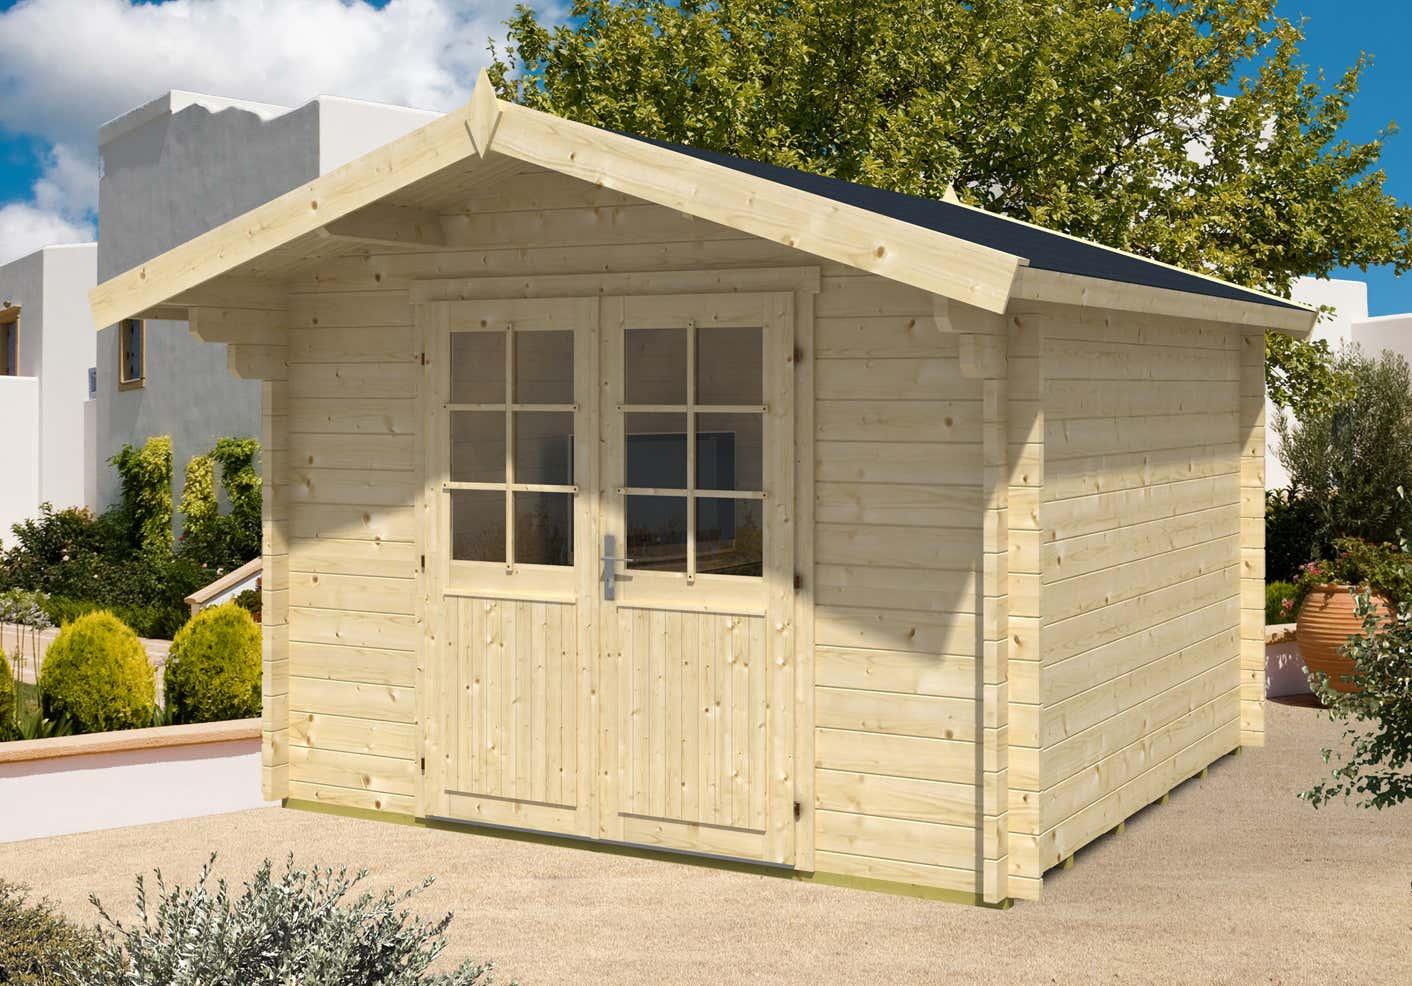 gartenhaus anna 44 iso a z gartenhaus gmbh. Black Bedroom Furniture Sets. Home Design Ideas